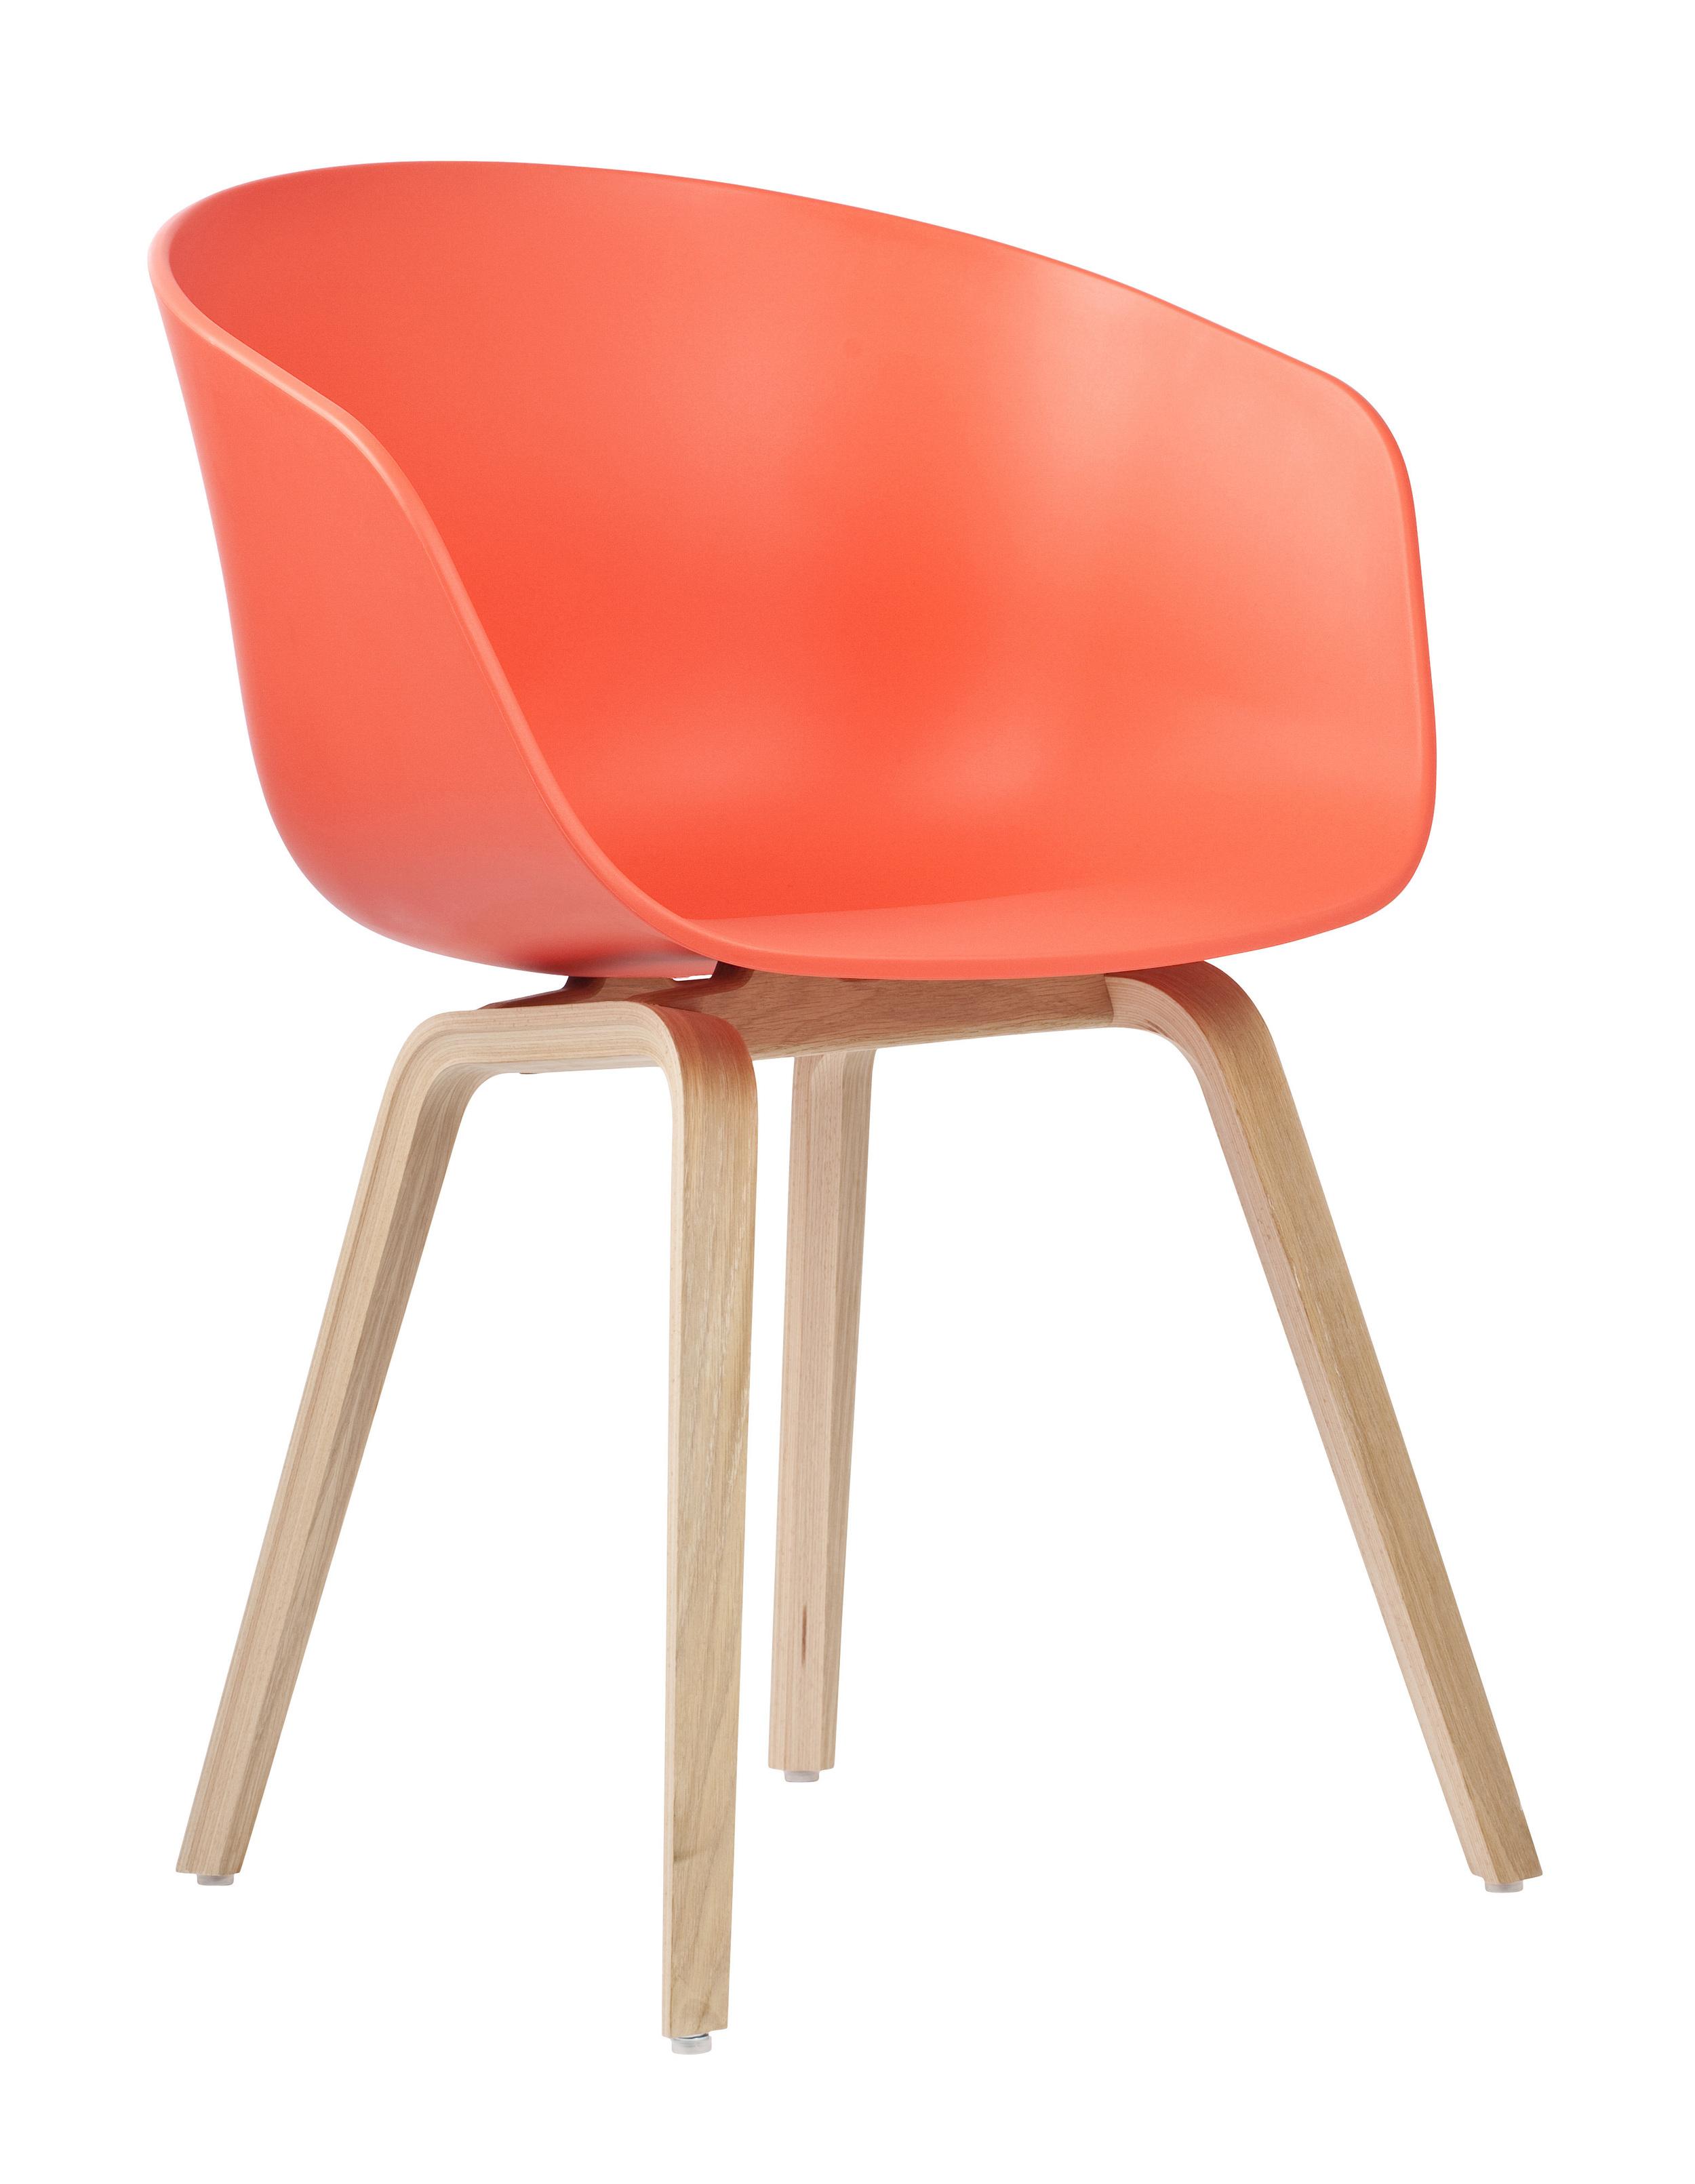 AAC22 Oak Soaped Base coral HAY About a chair design stoel Loncin design meubel zetel Leuven Brussels mechelen antwerpen vlaams-branbant Limburg Hasselt Tongeren Genk Sint-Truiden Zoutleeuw.jpg